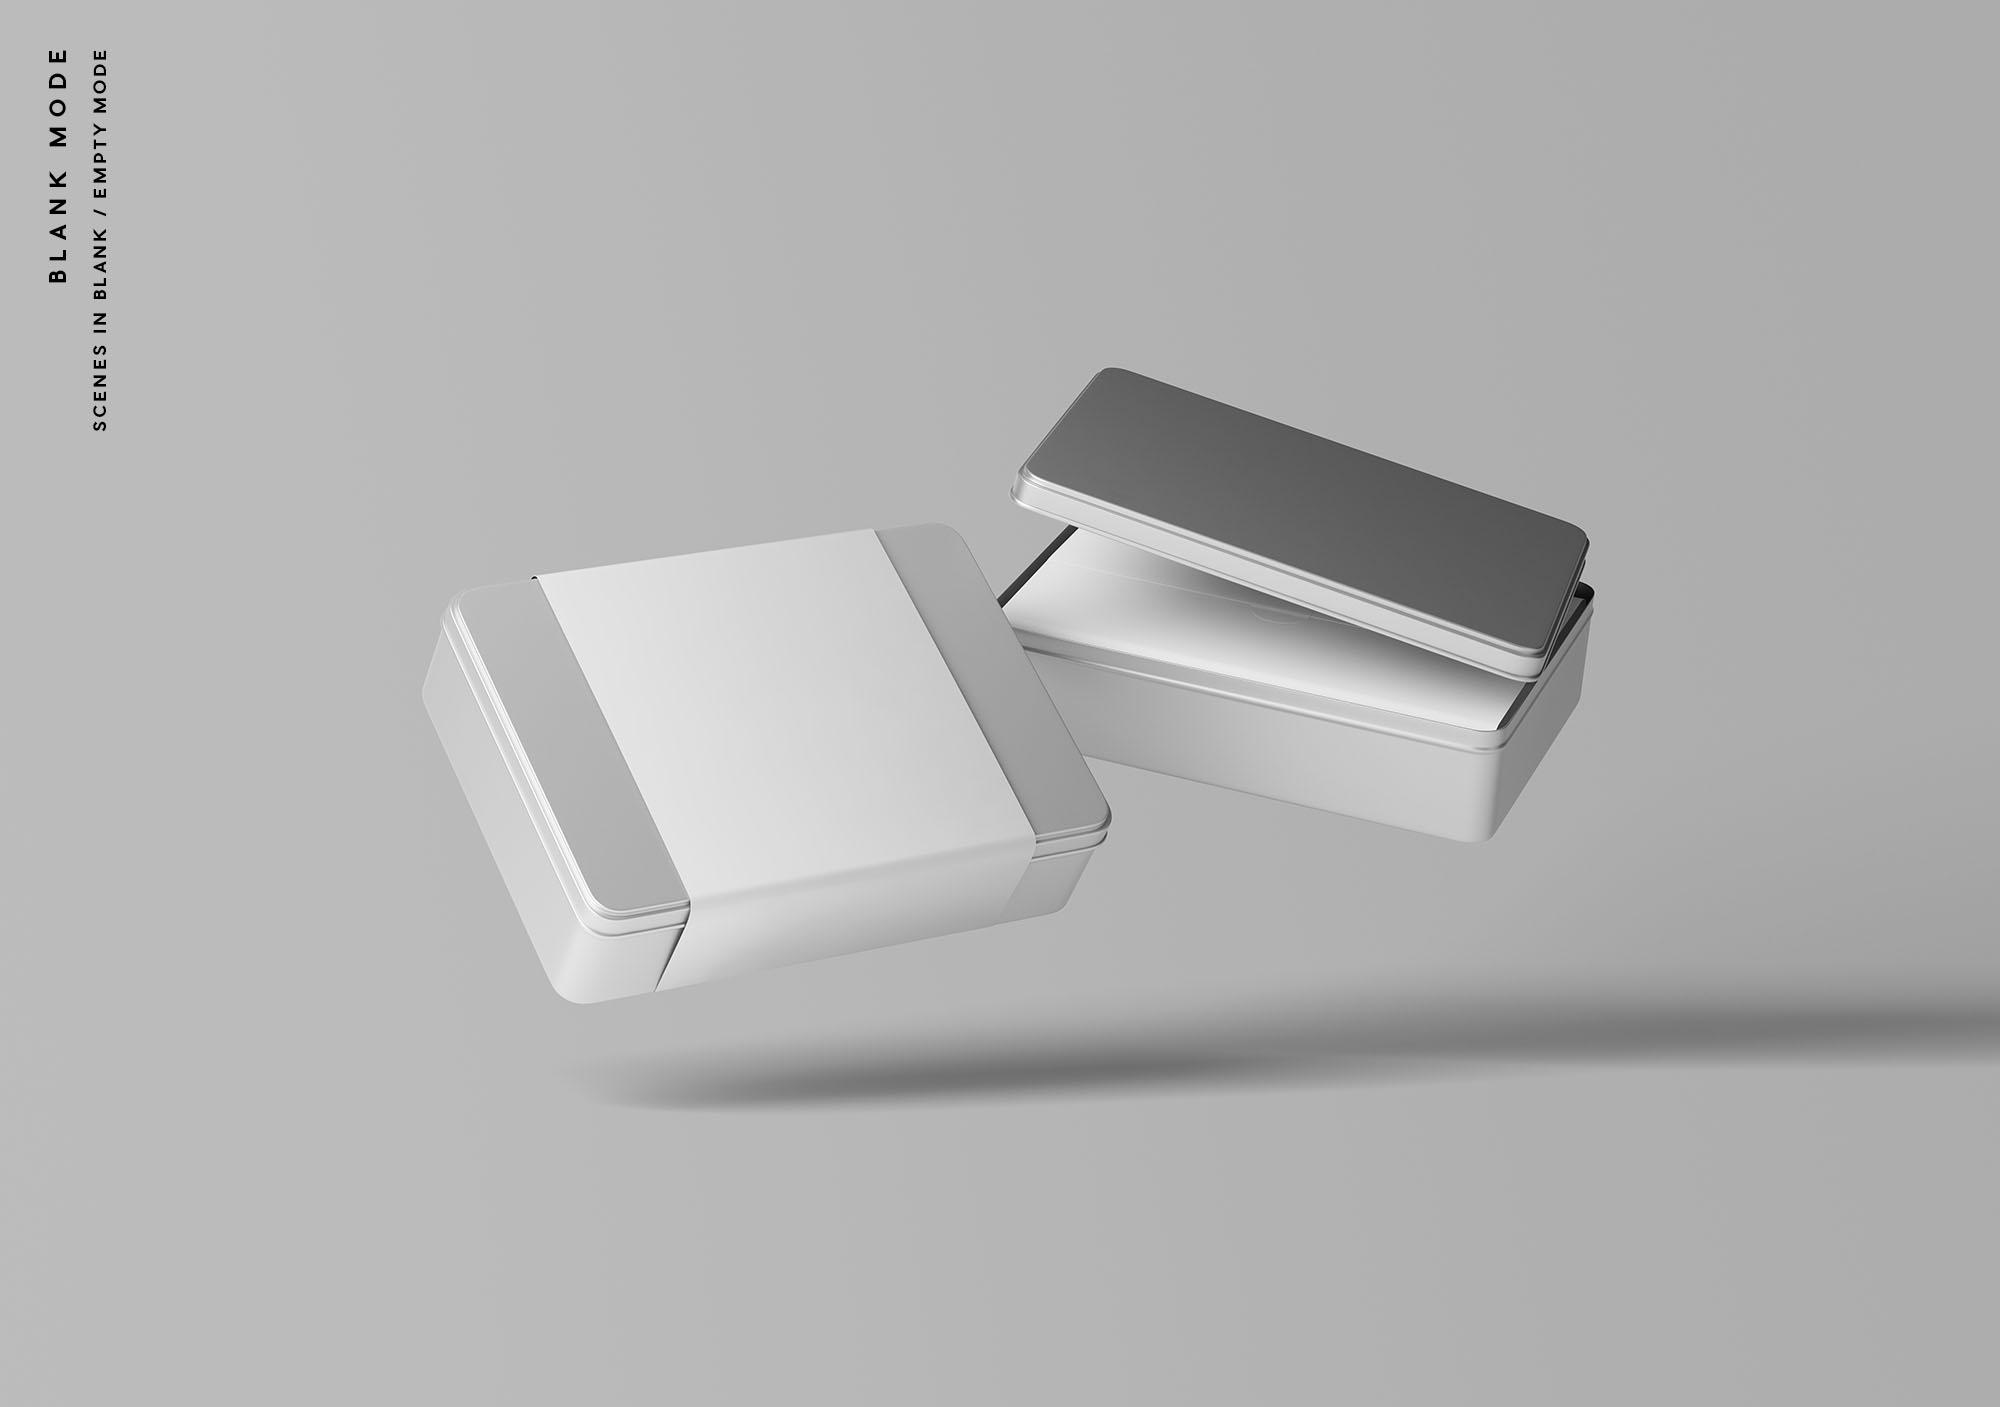 Metal Box Mockup - Blank Mode